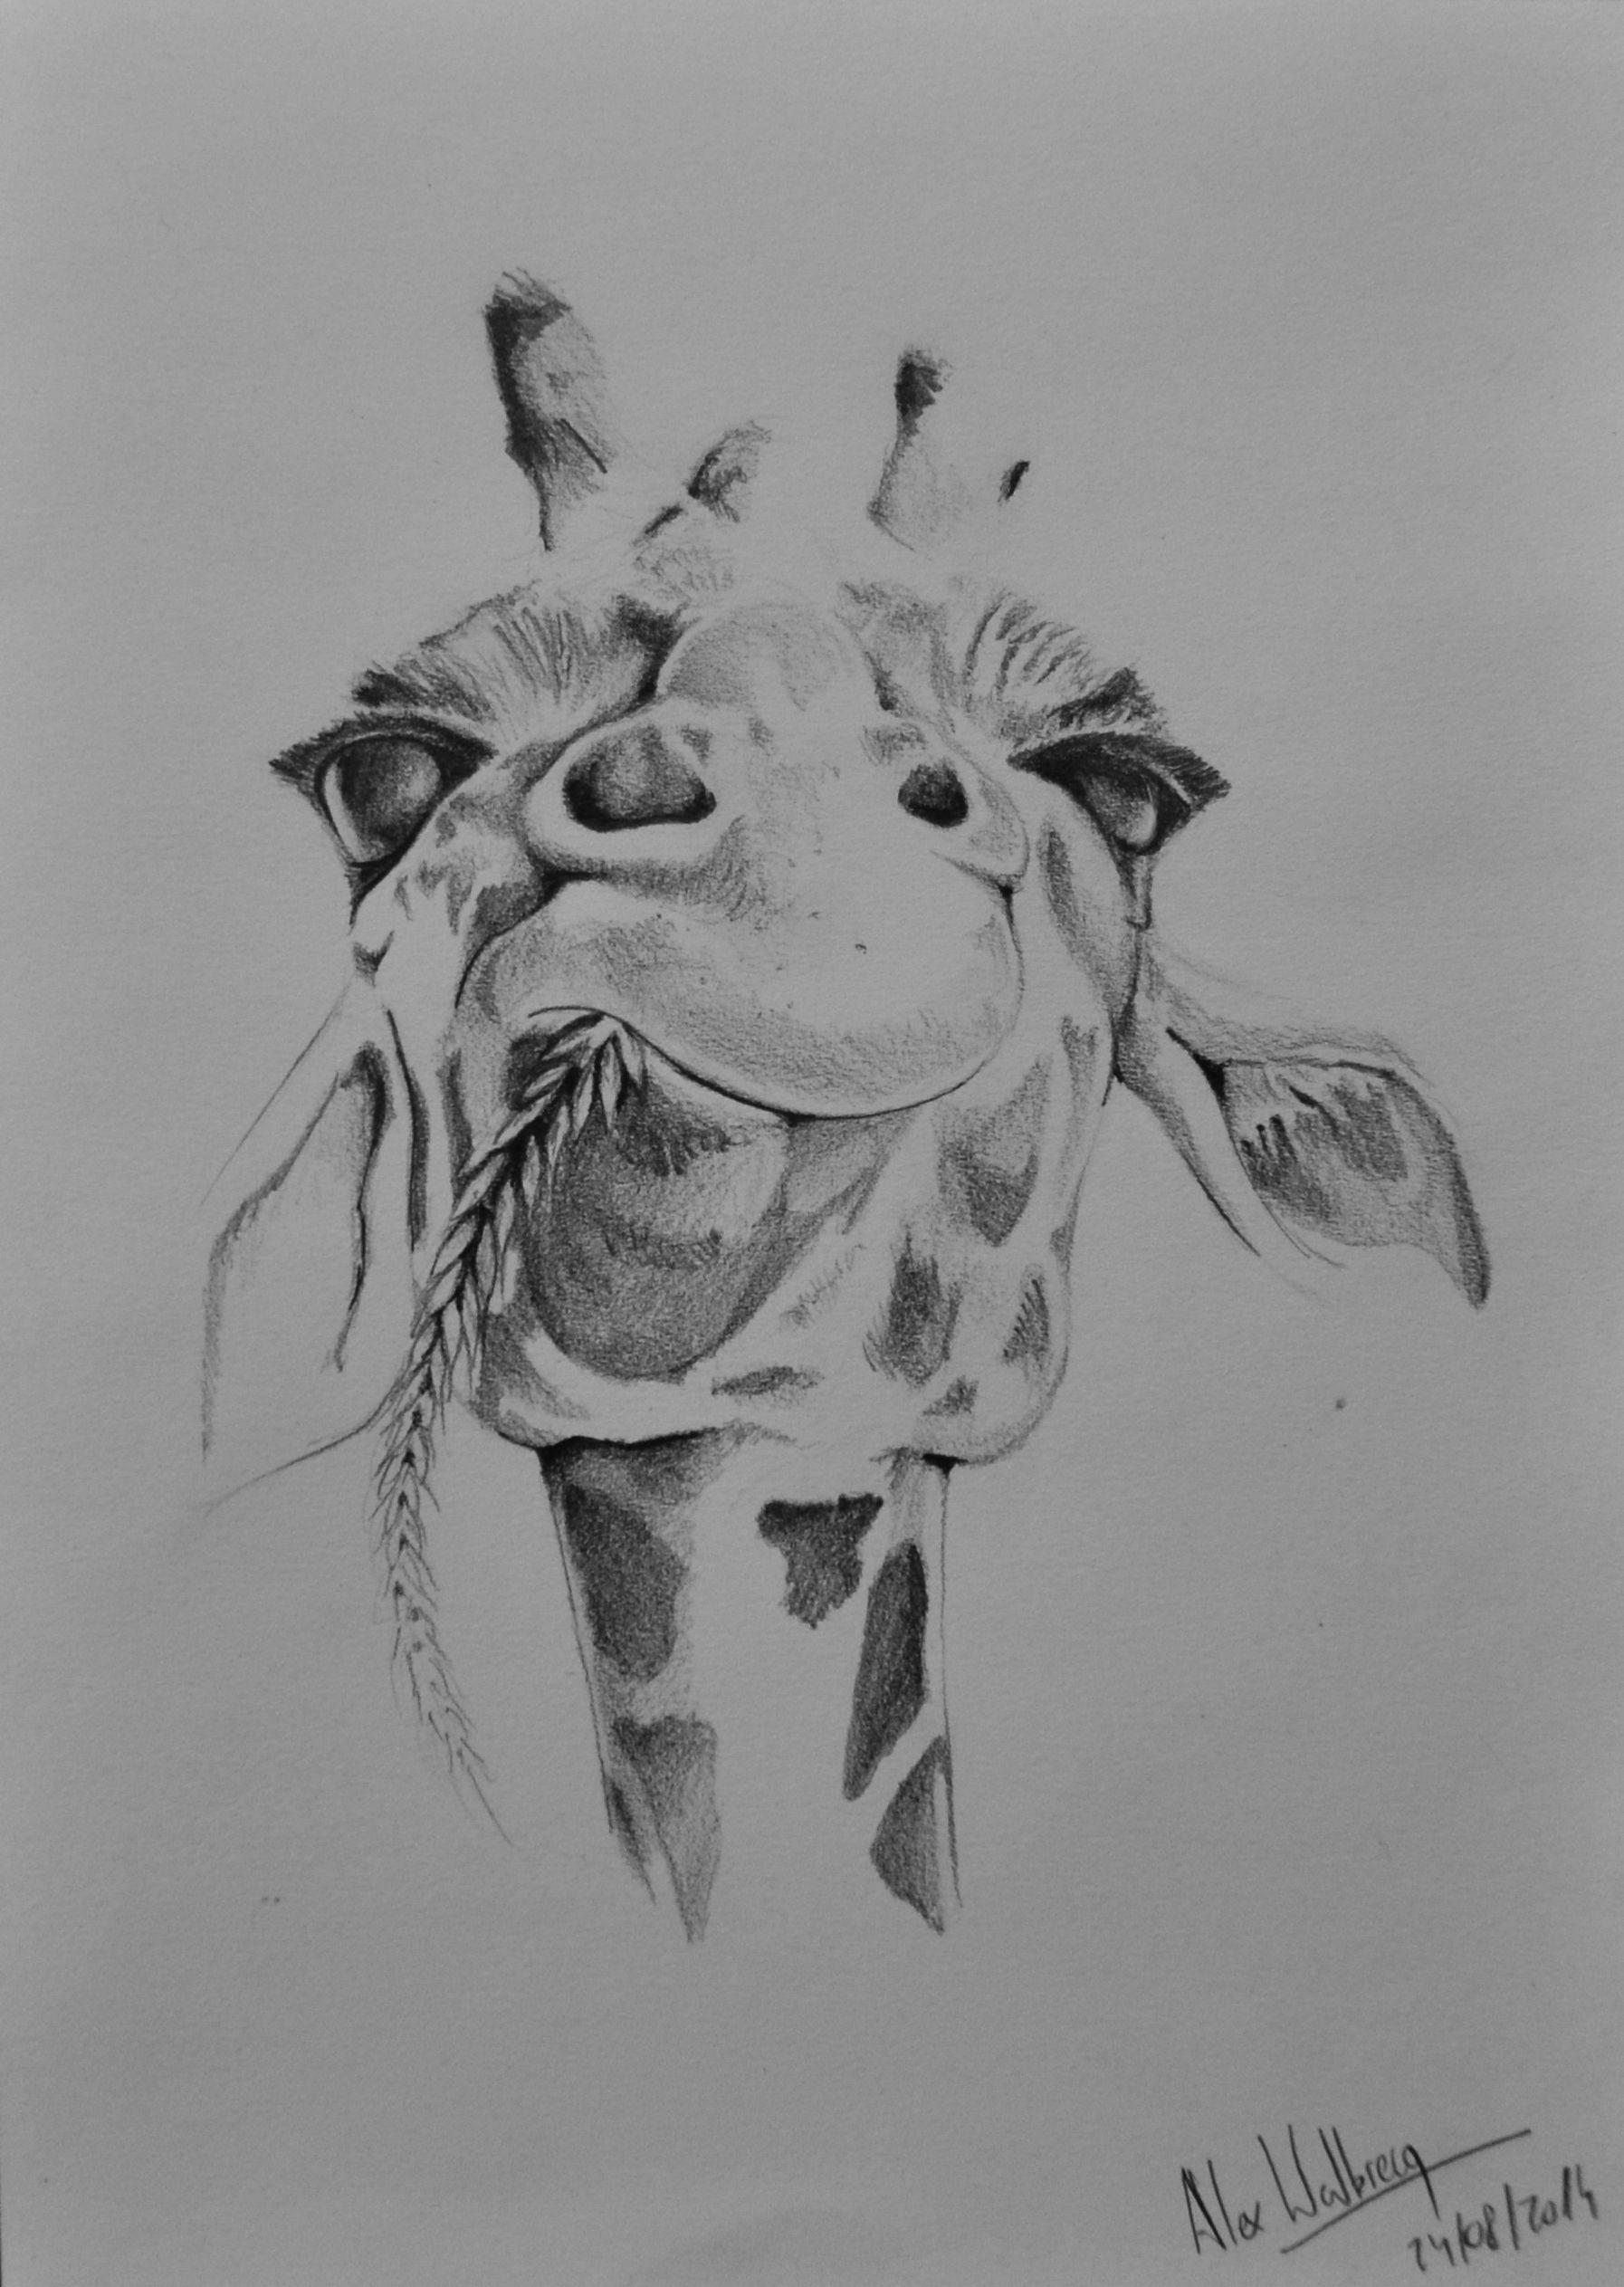 An Impassive Giraffe Pencil Drawing Dessin Au Crayon Dibujo A Lapiz Giraffe Drawing Giraffe Art Animal Drawings